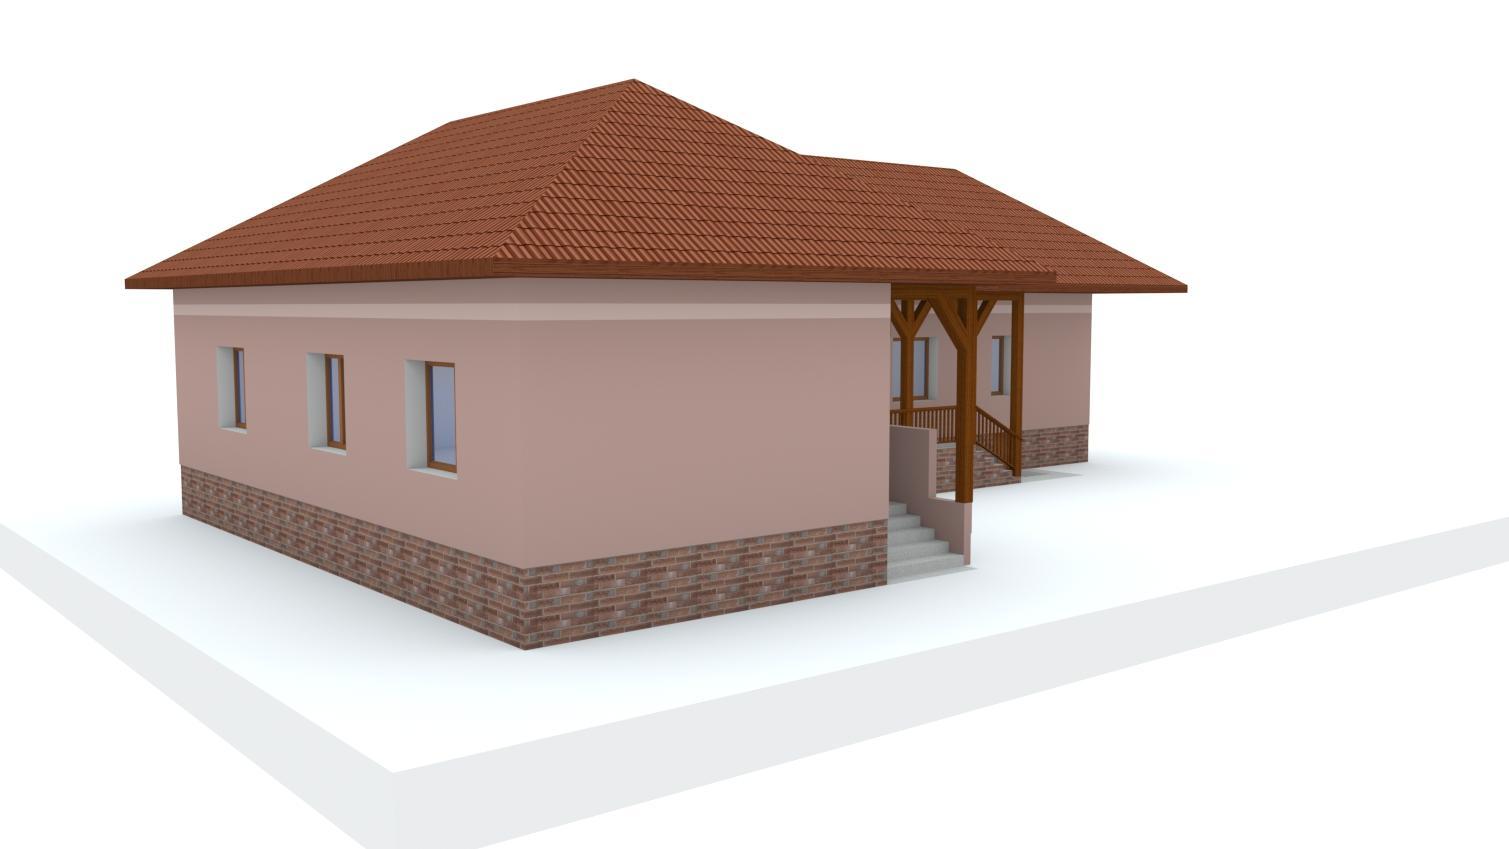 Návrh fasády rodinného domu - Obrázok č. 5